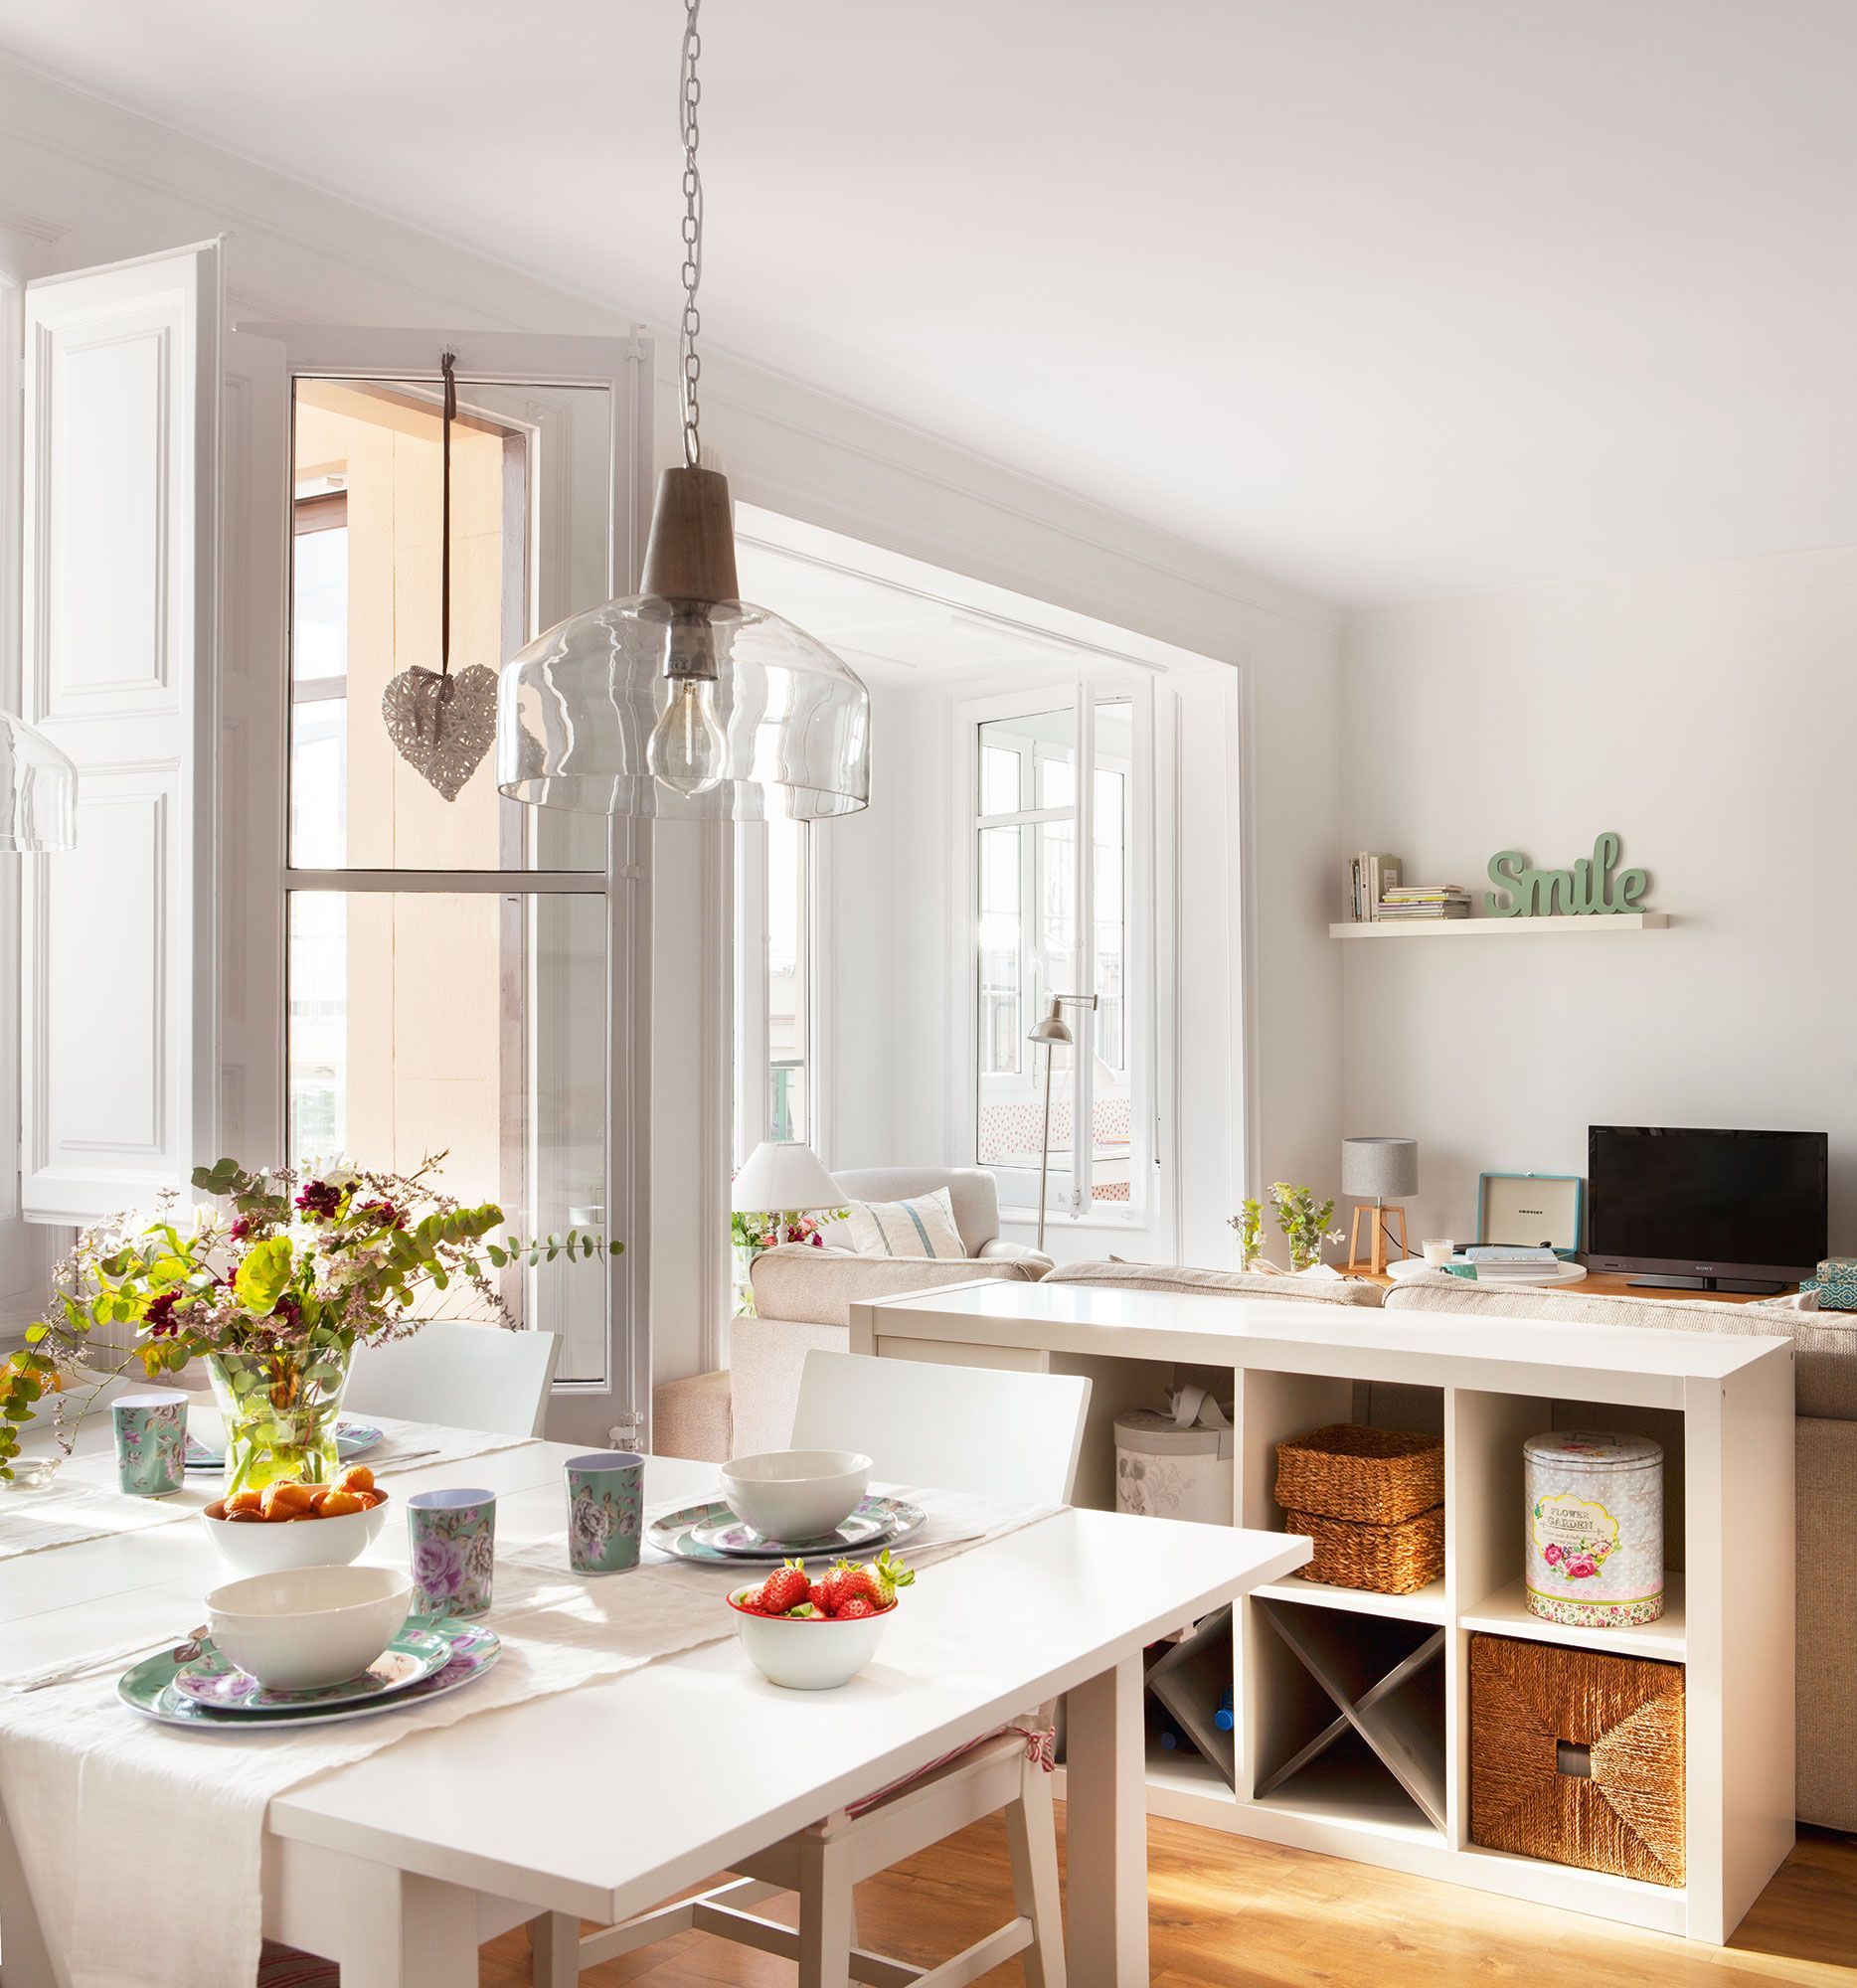 En el office casa mueble salon ikea muebles de for Ikea muebles salon comedor